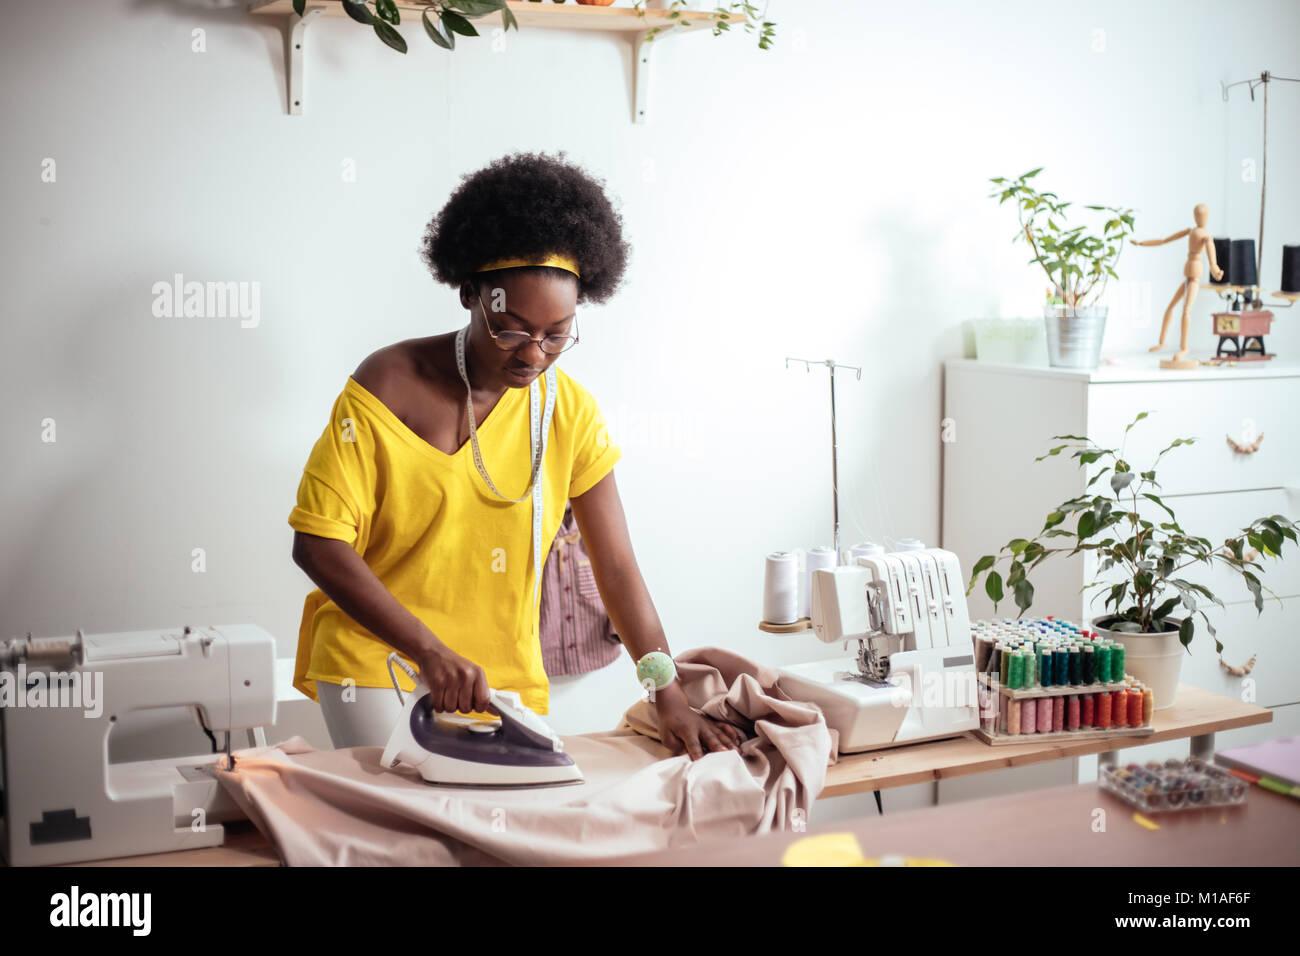 african Woman seamstress Ironing cloth - Stock Image